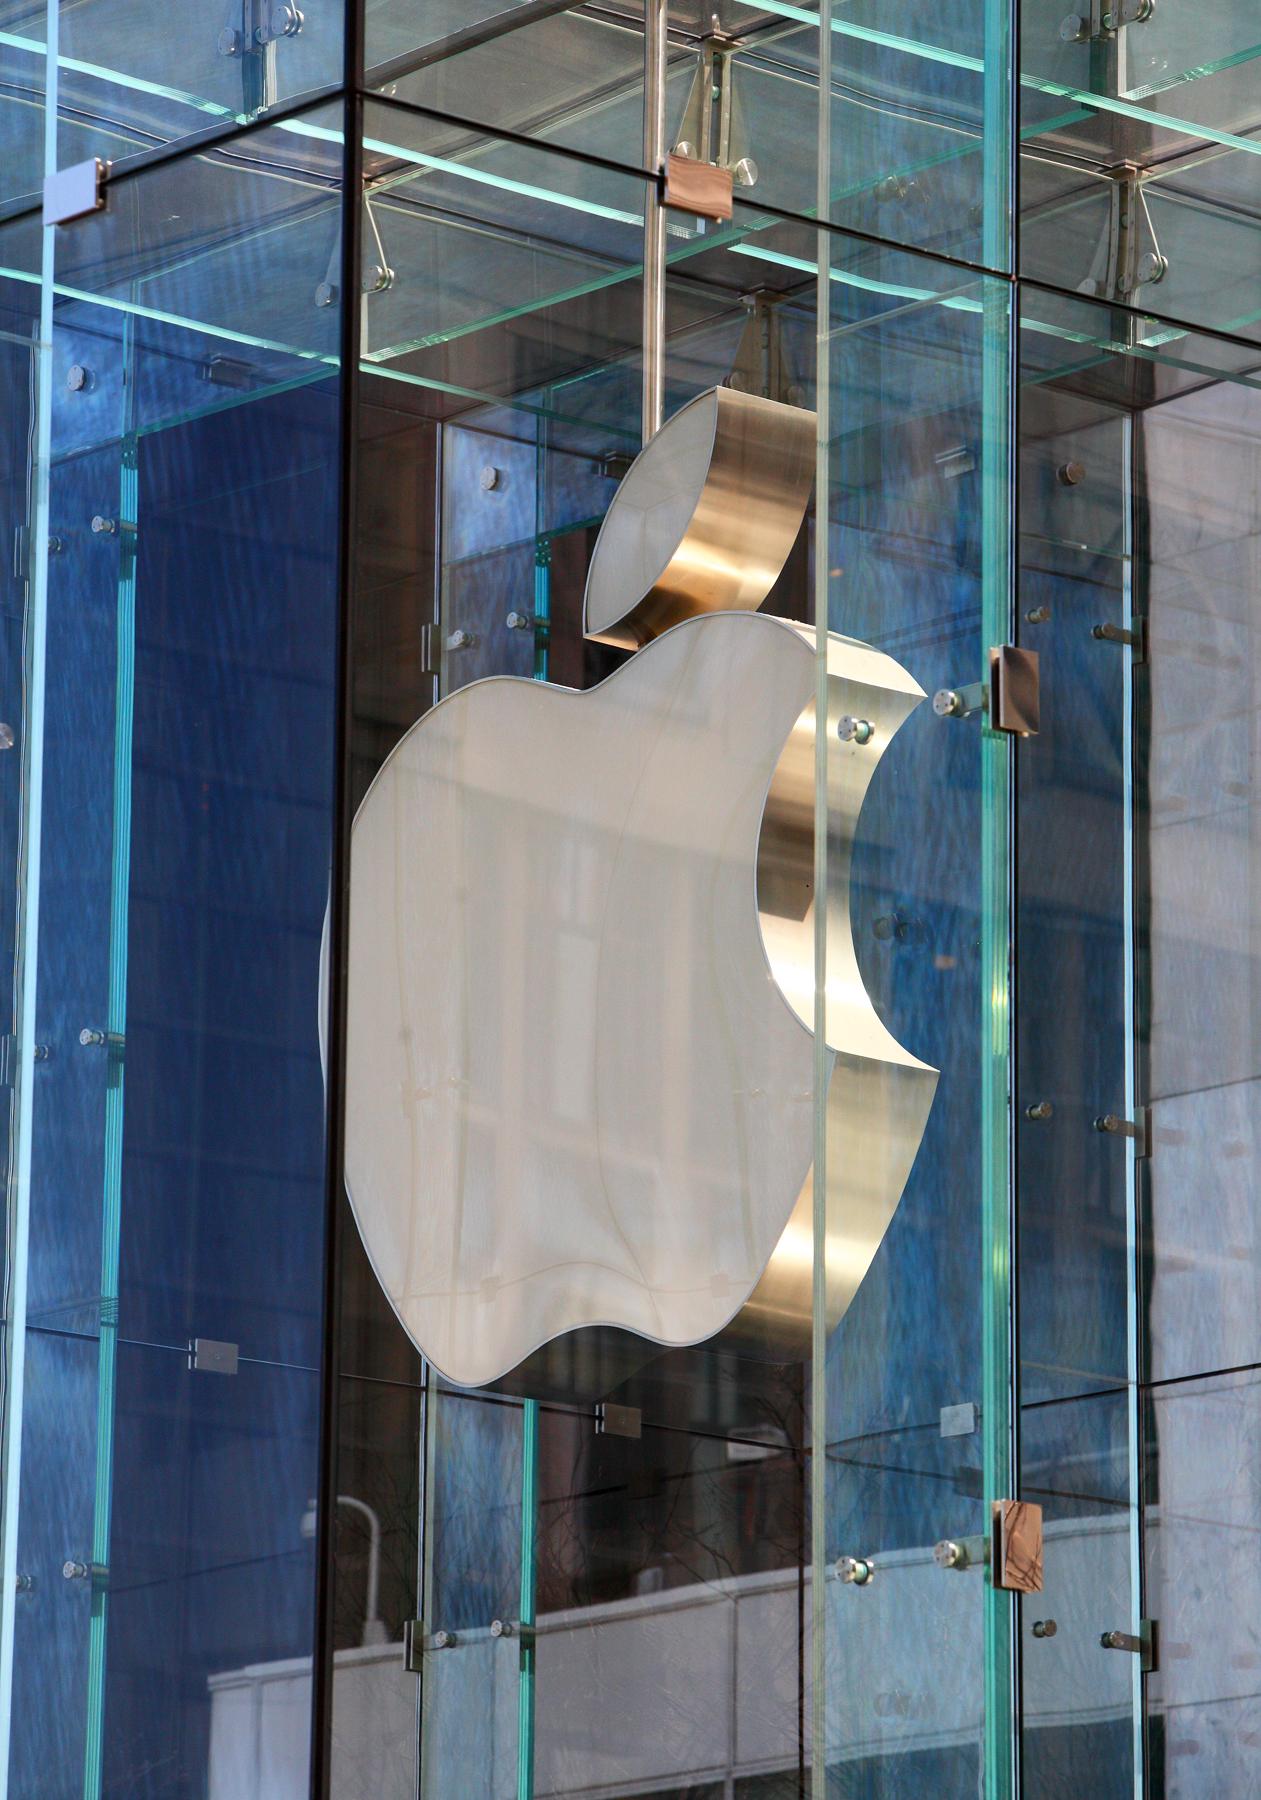 Apple in Talks to Buy Beats Electronics for $3.2 Billion